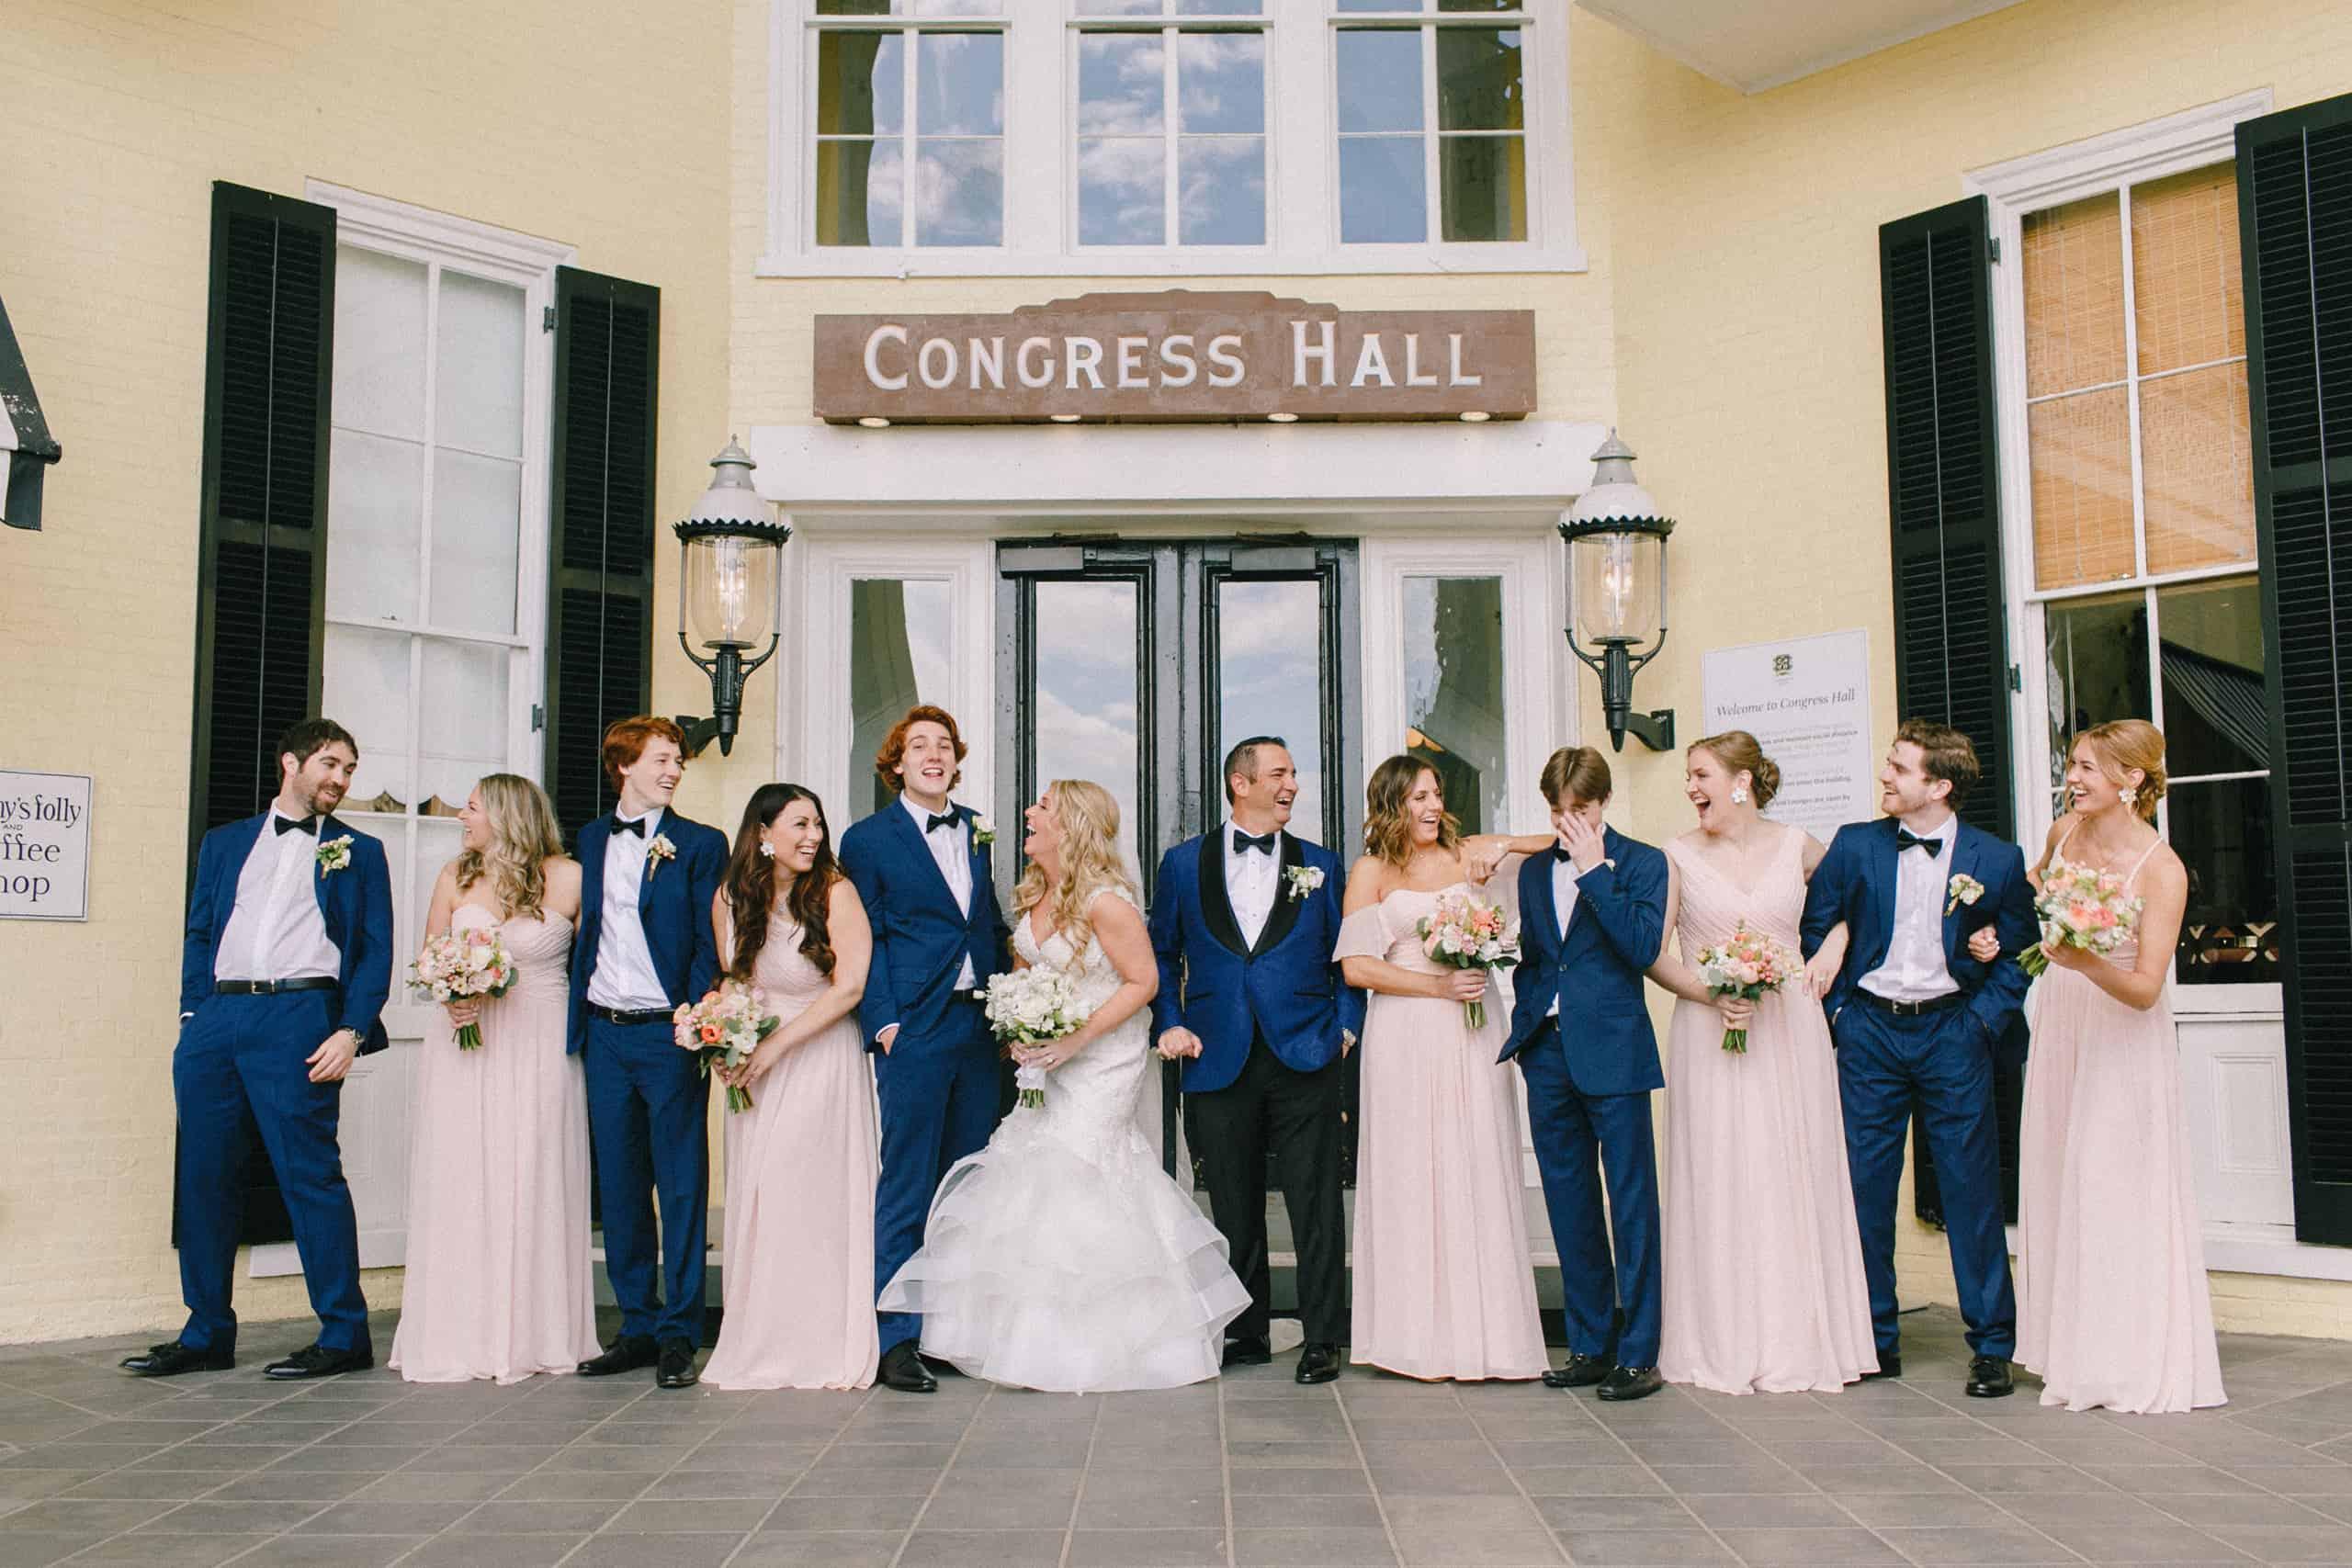 Congress Hall Wedding Party